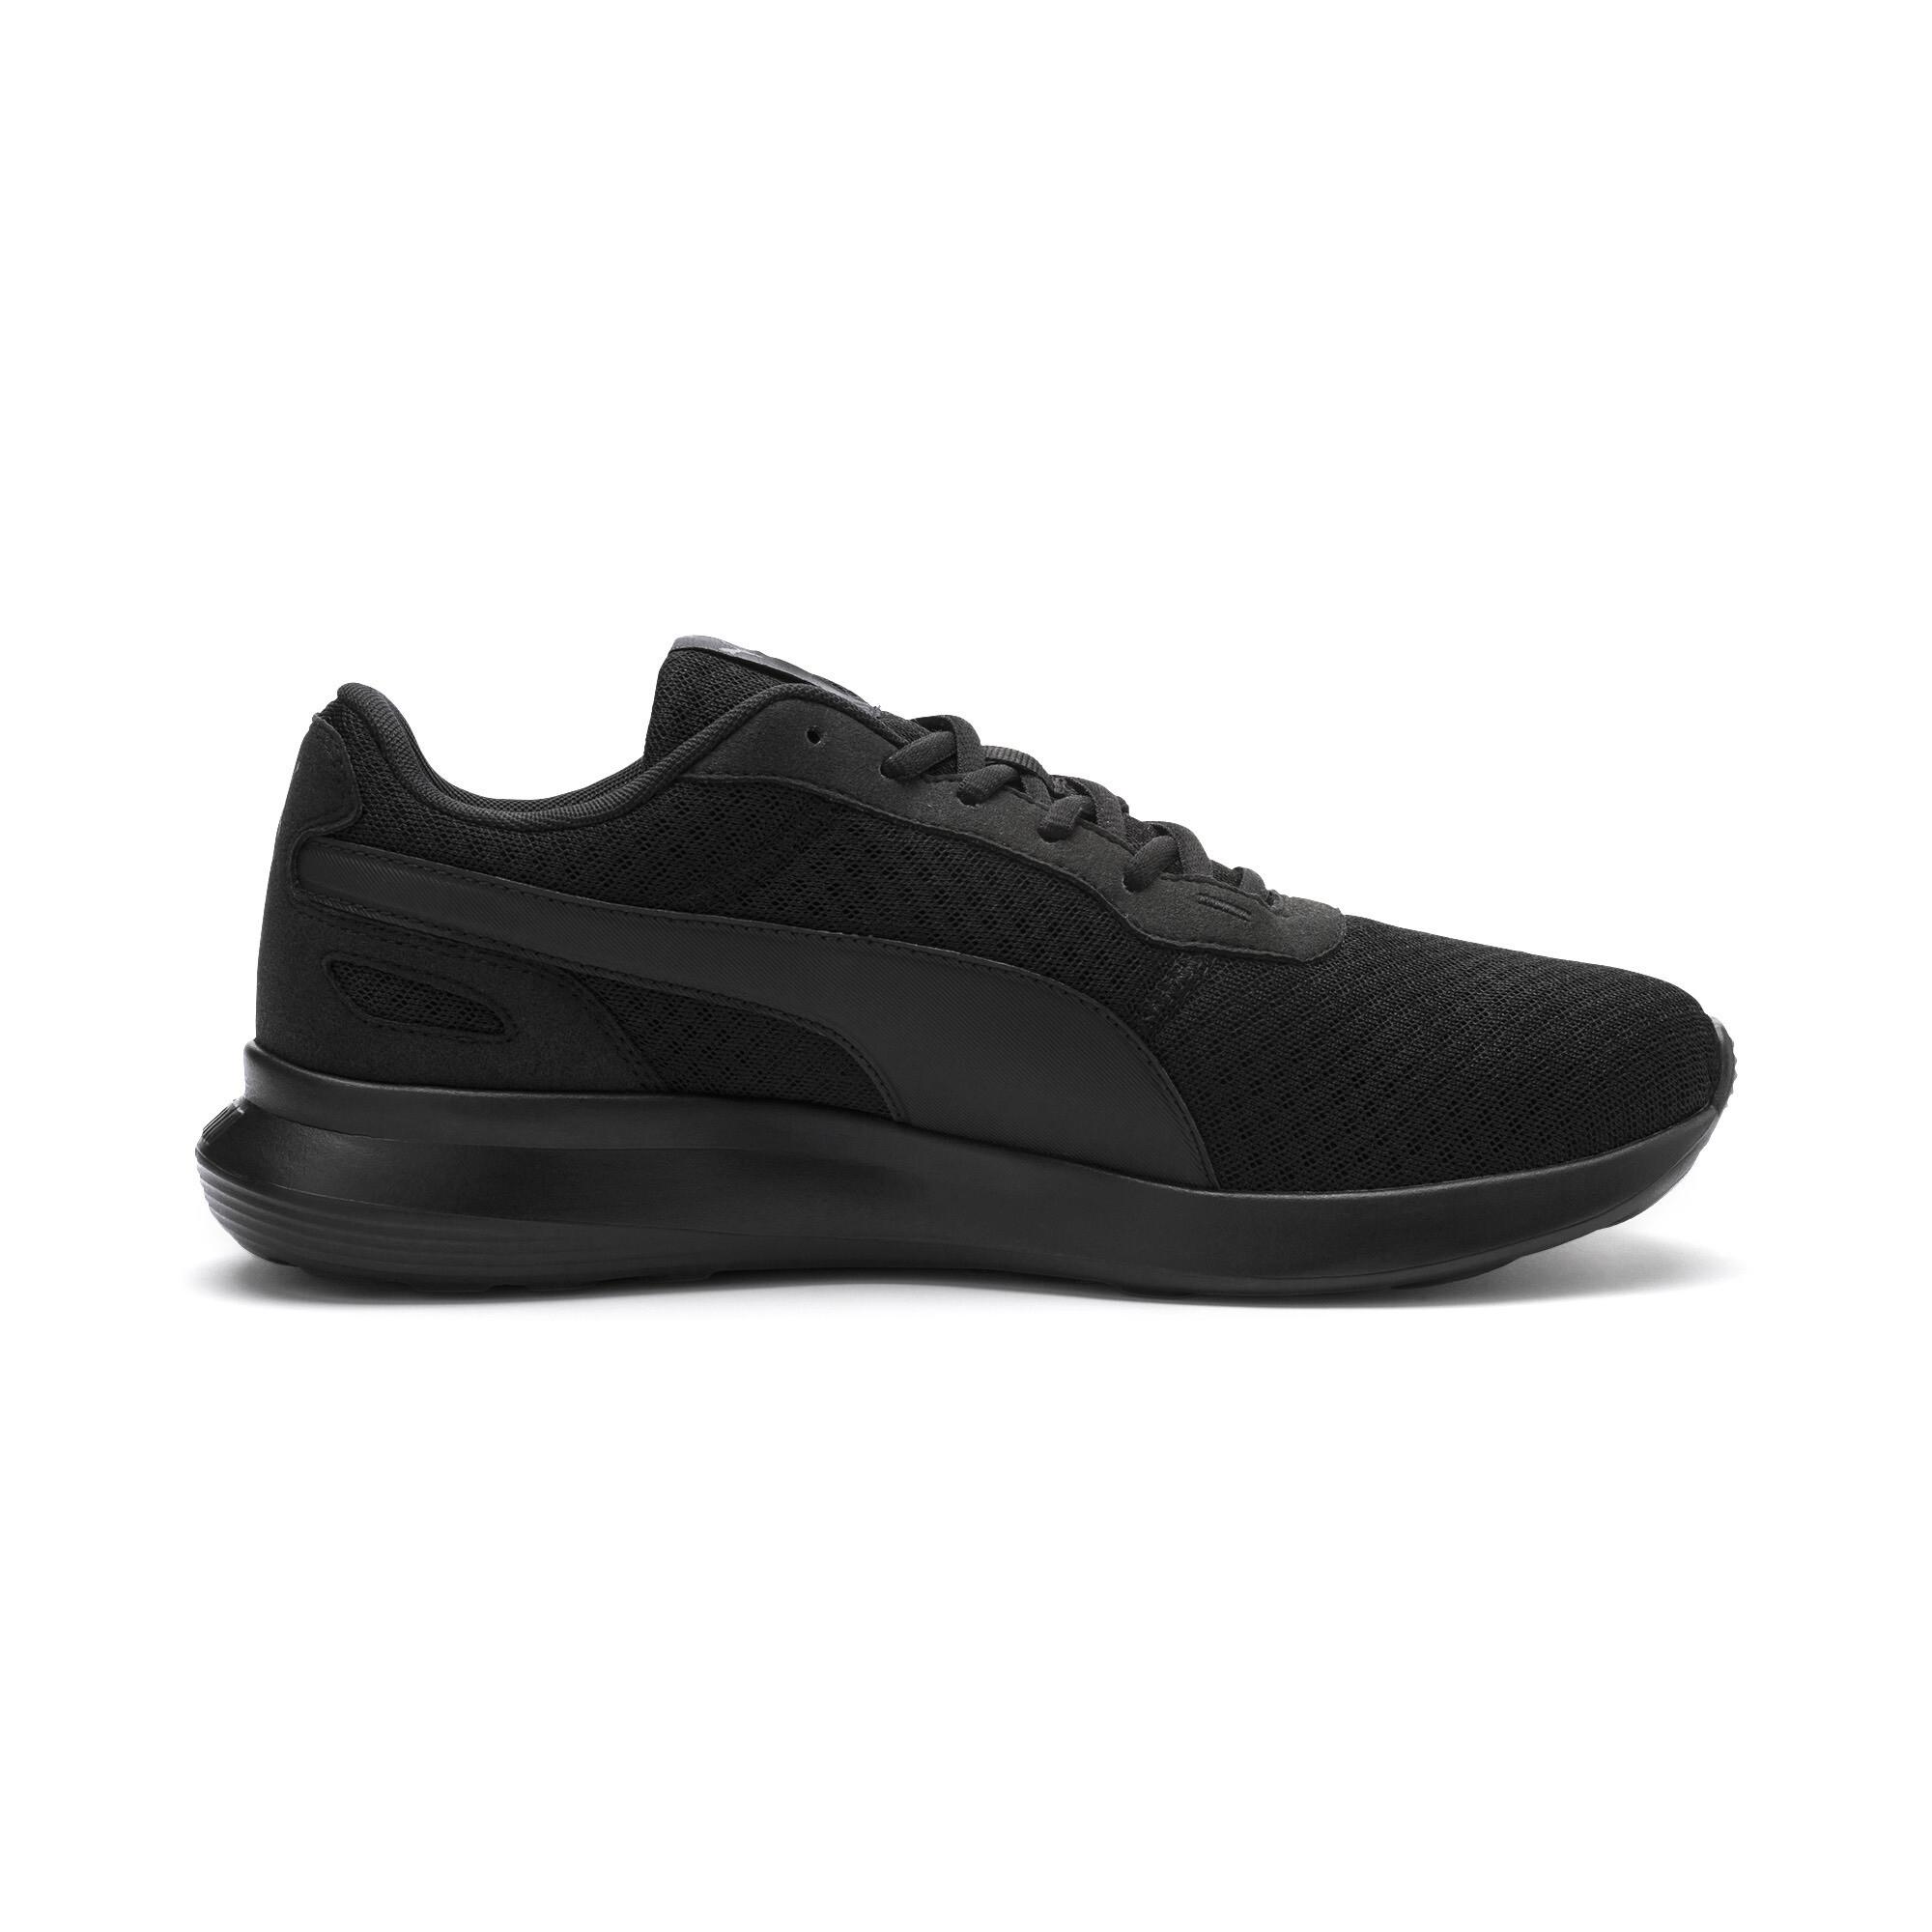 PUMA-Men-039-s-ST-Activate-Sneakers thumbnail 6